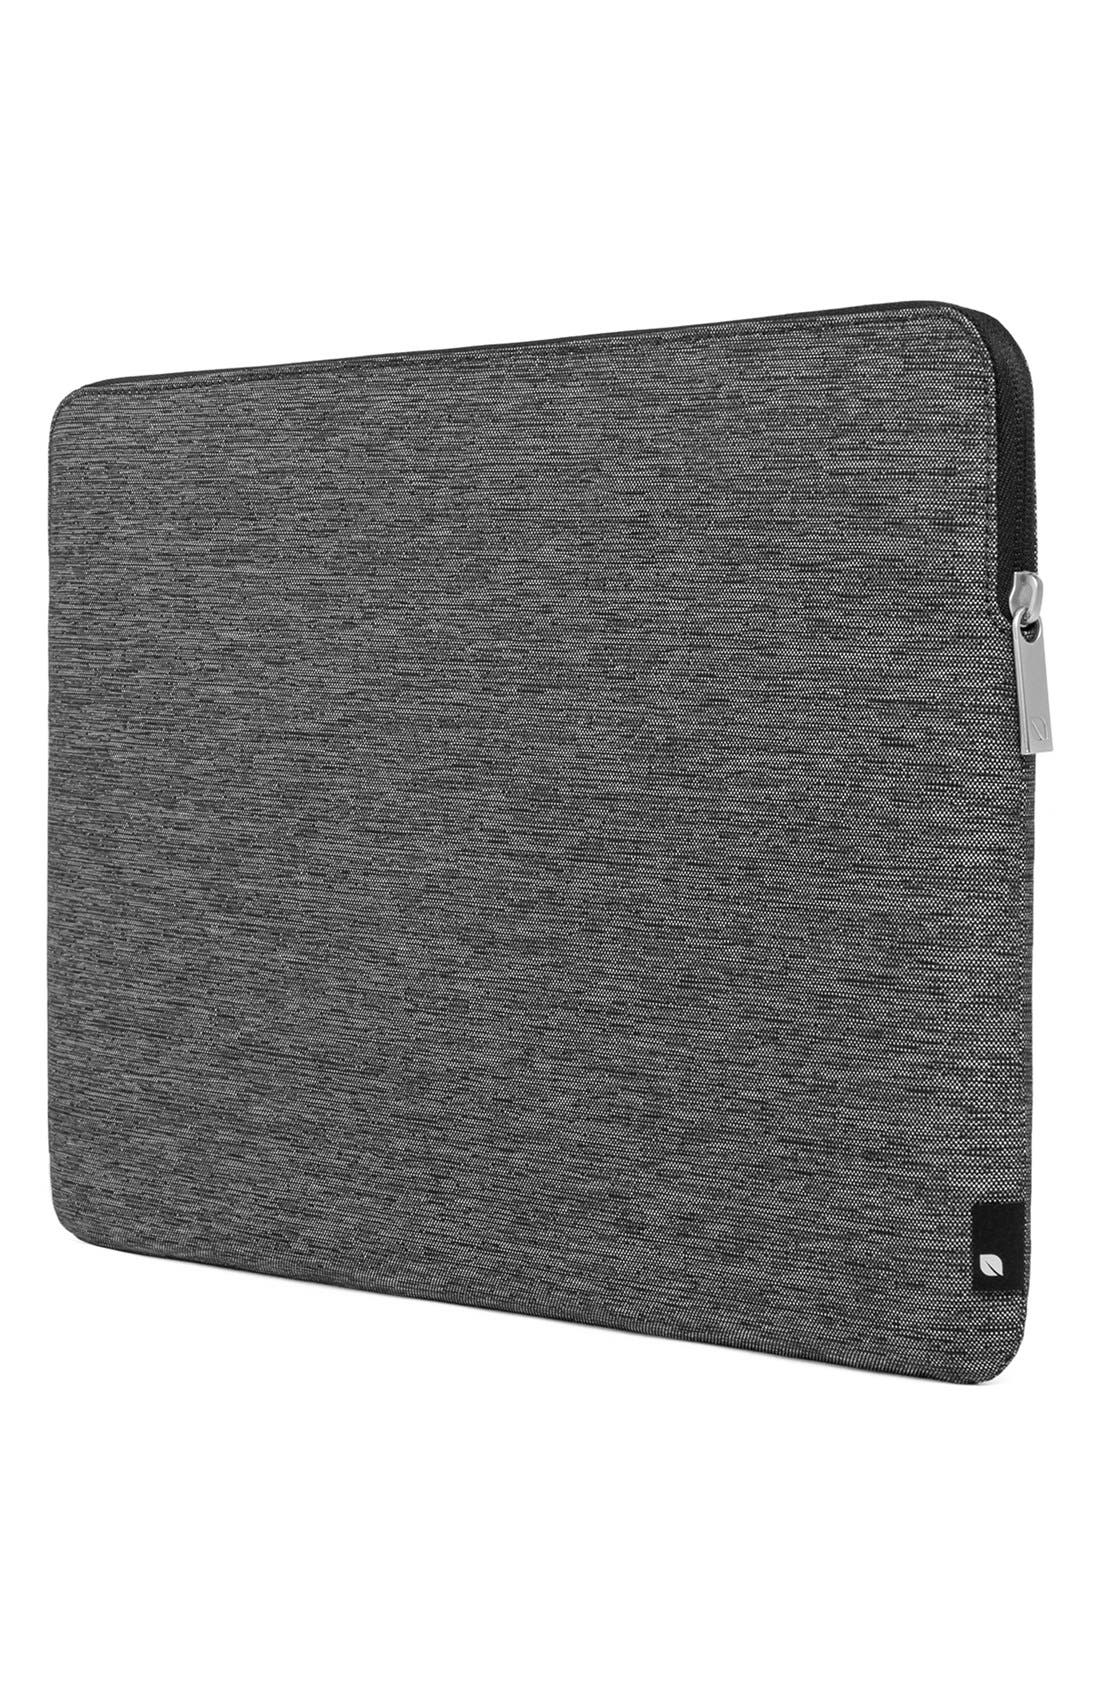 MacBook Air Sleeve,                             Main thumbnail 1, color,                             HEATHER  BLACK